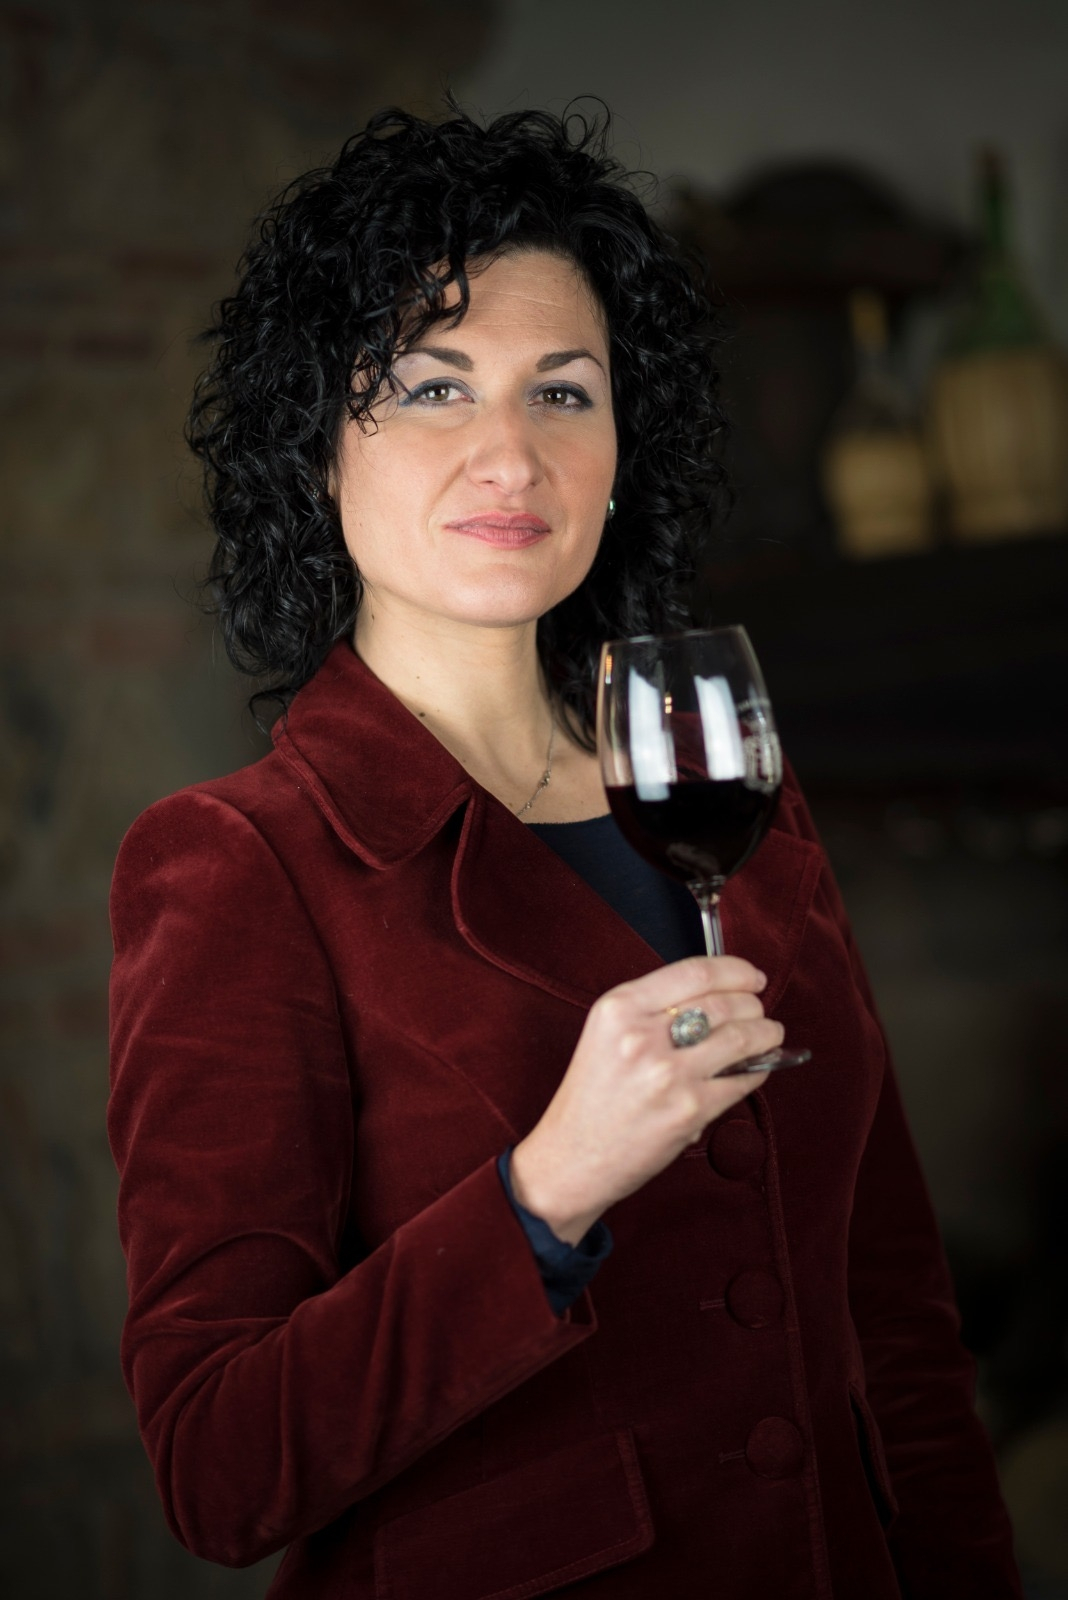 Emanuela Tamburini, giovane imprenditrice vinicola al vertice del Mtv Toscana